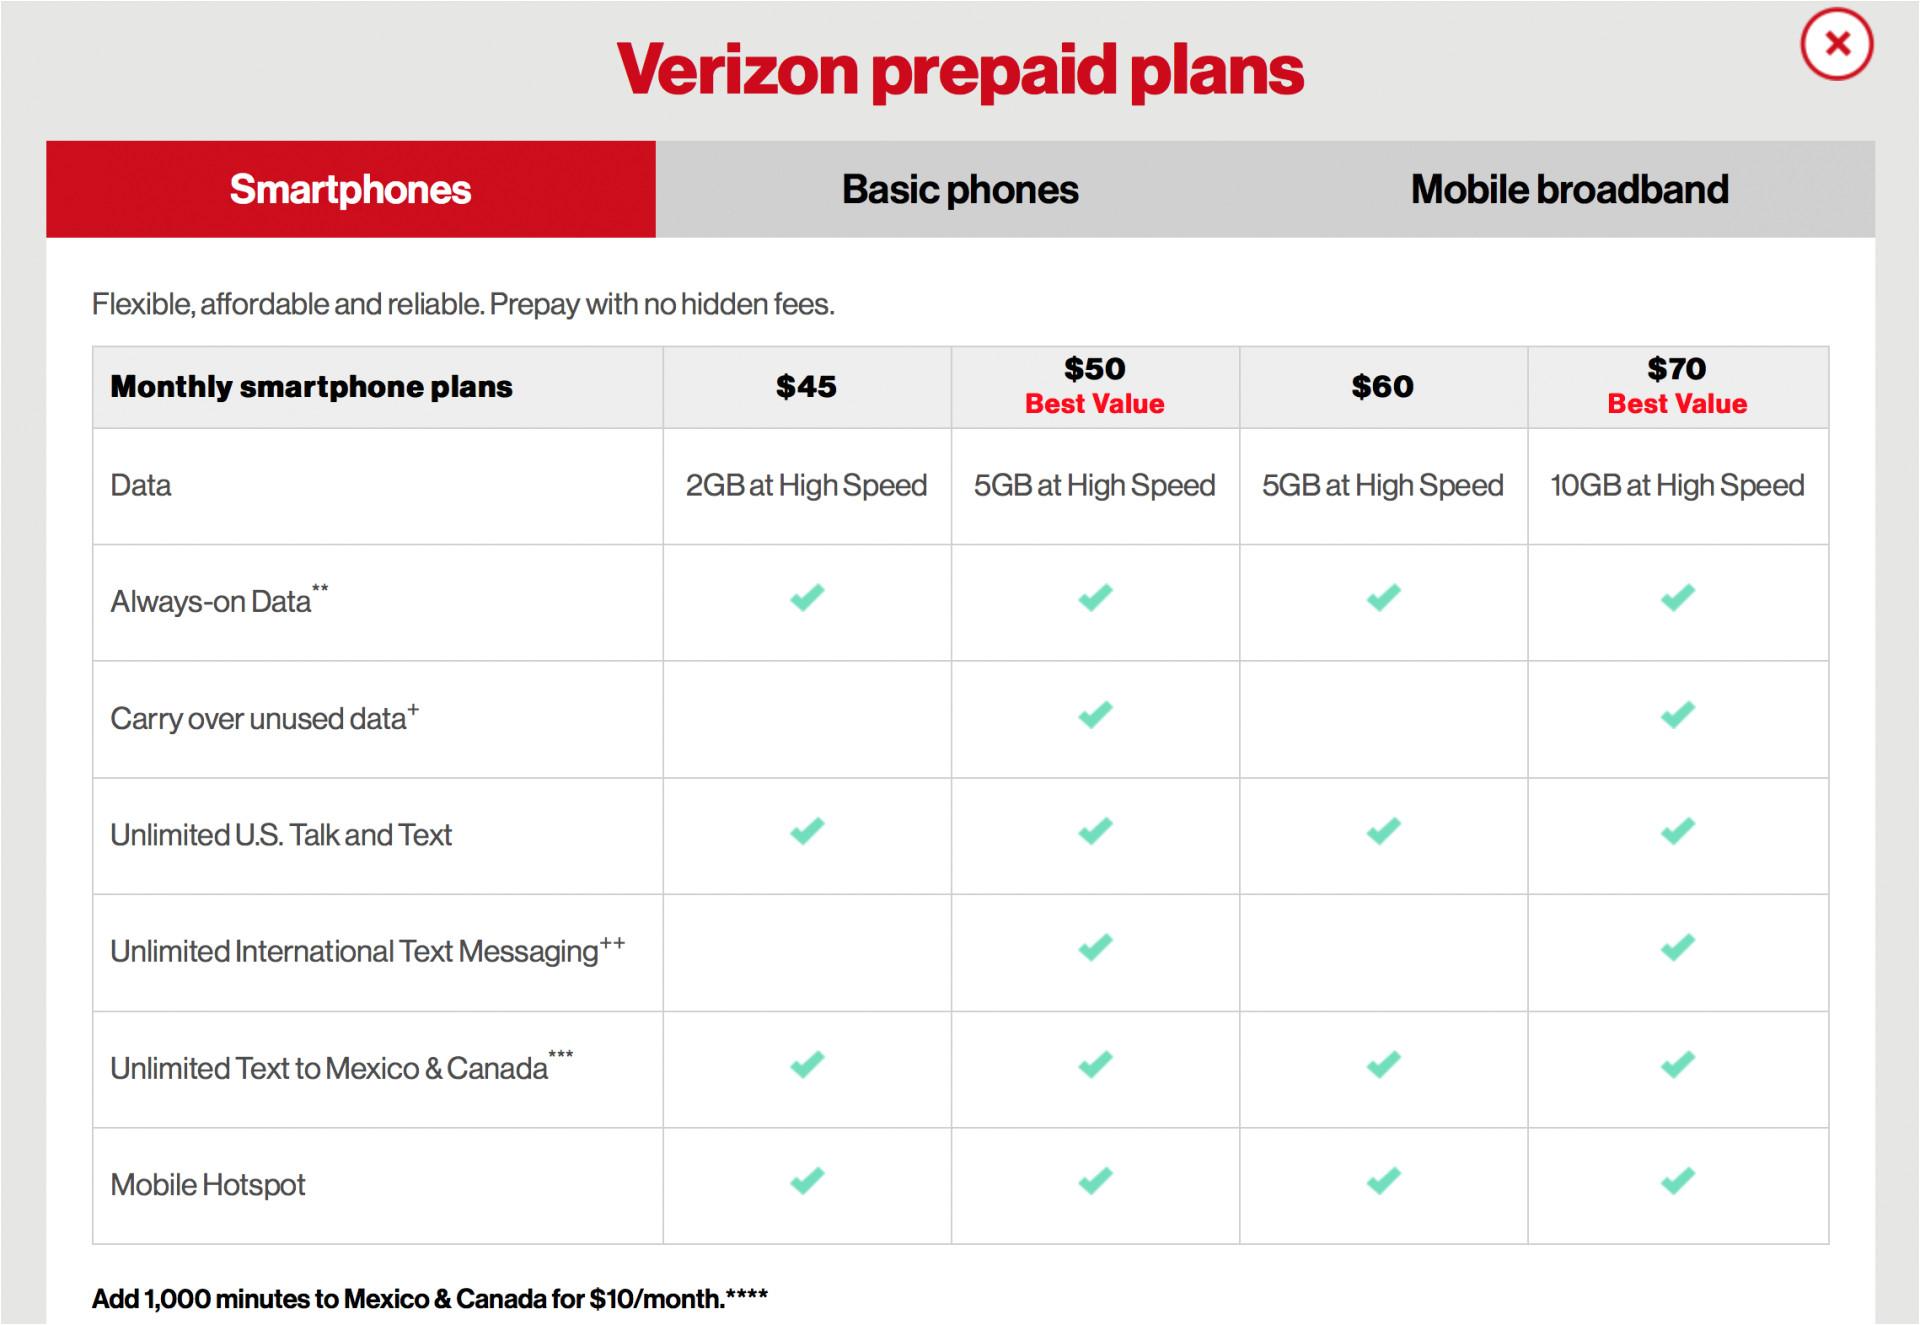 verizon wireless home internet plans